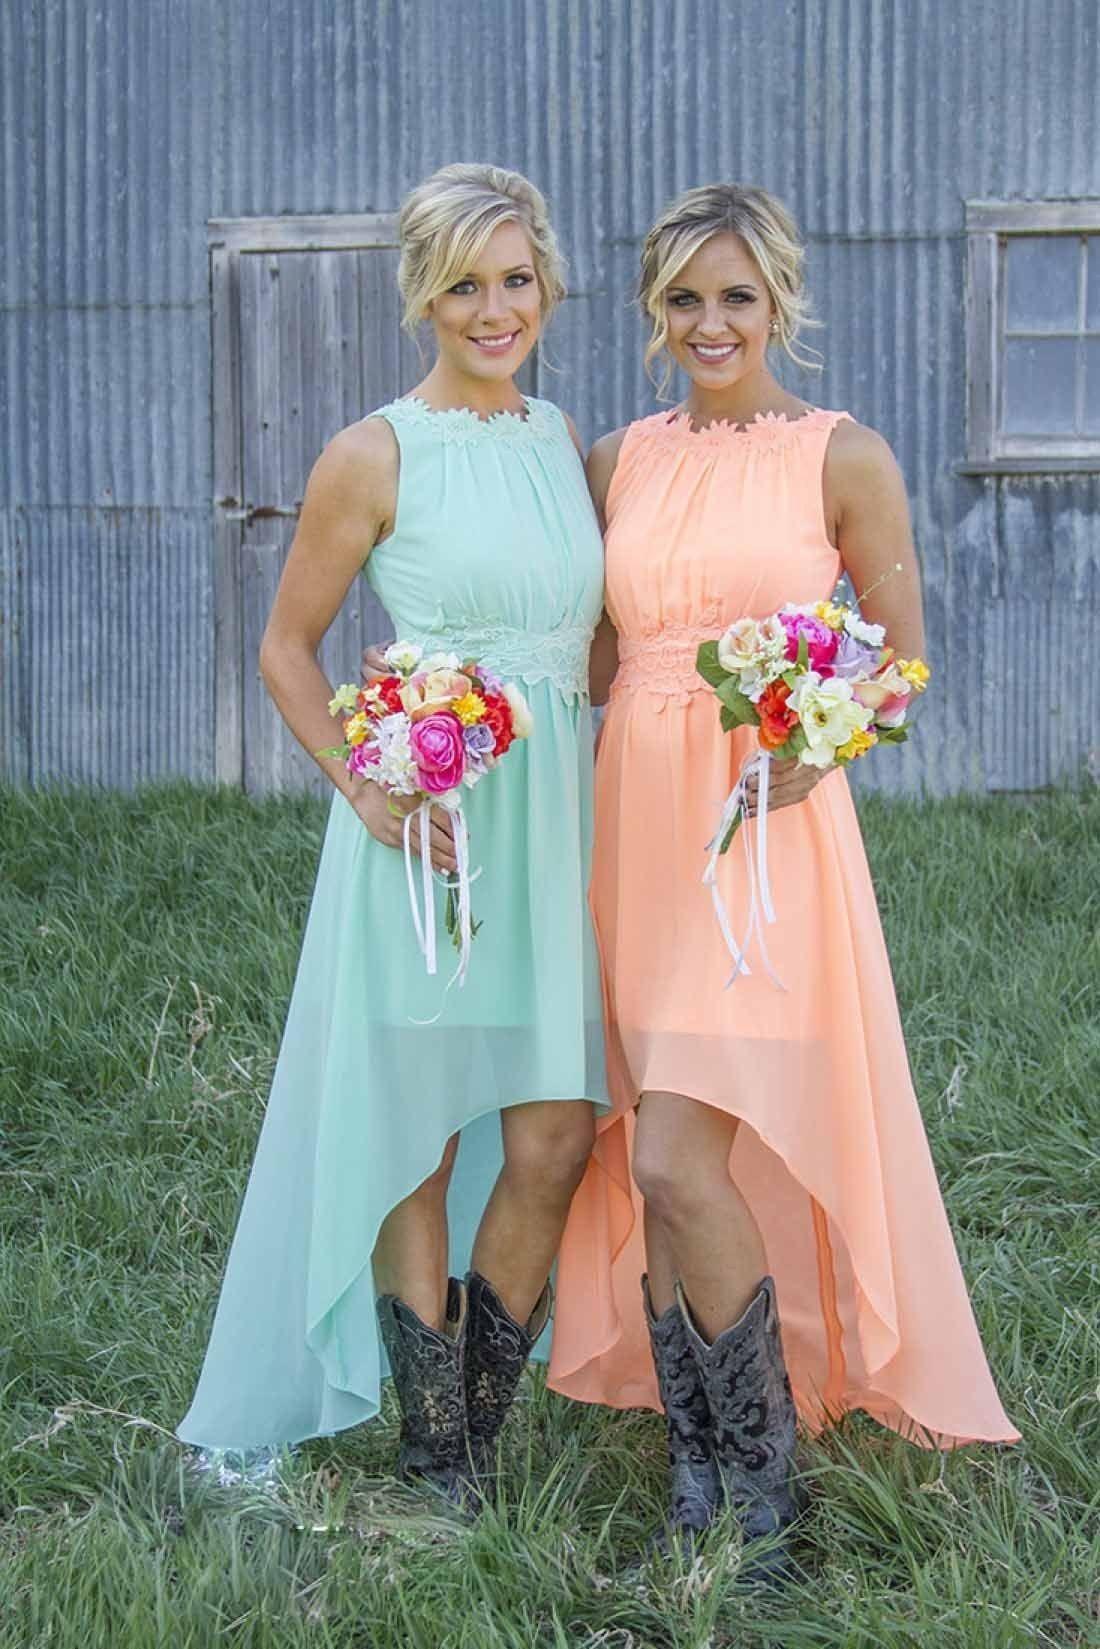 Pin by Elissa Blevins on bridesmaids   Pinterest   Wedding, Weddings ...